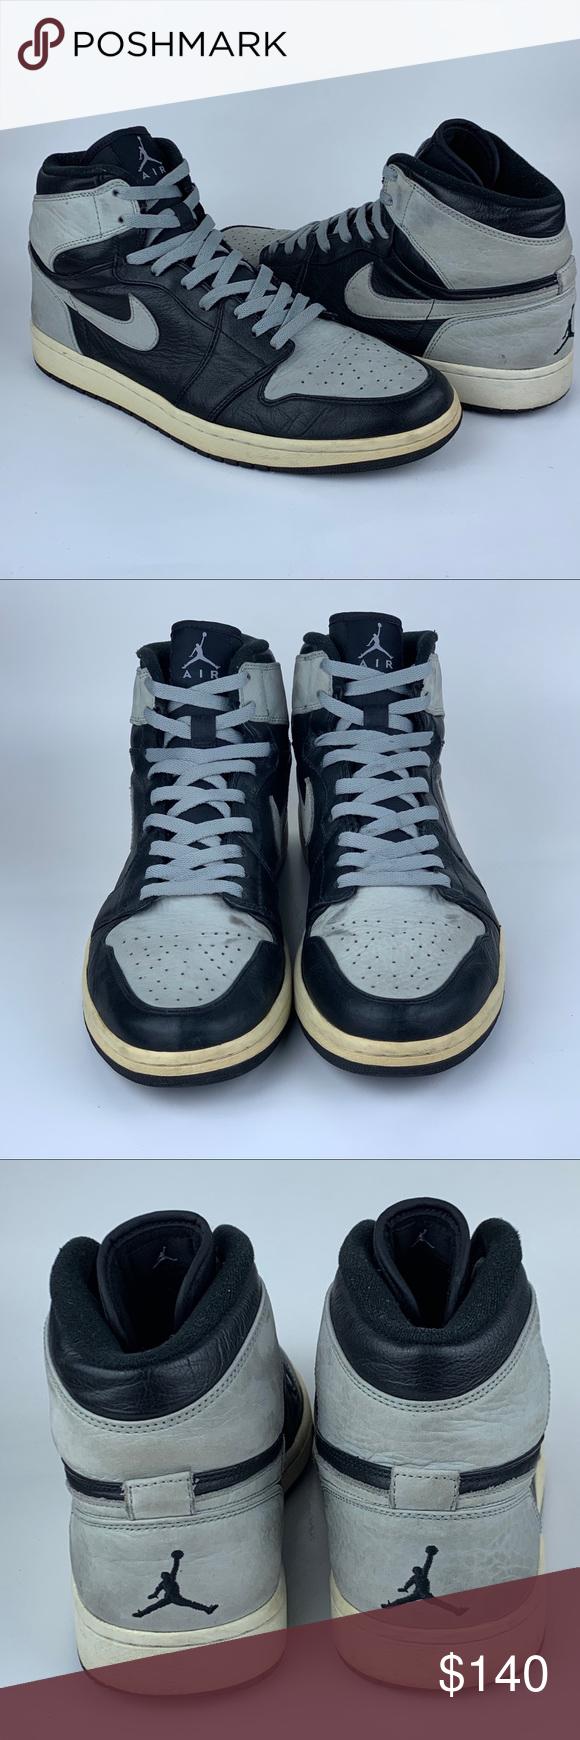 Nike Air Jordan 1 Retro High 2009 OG